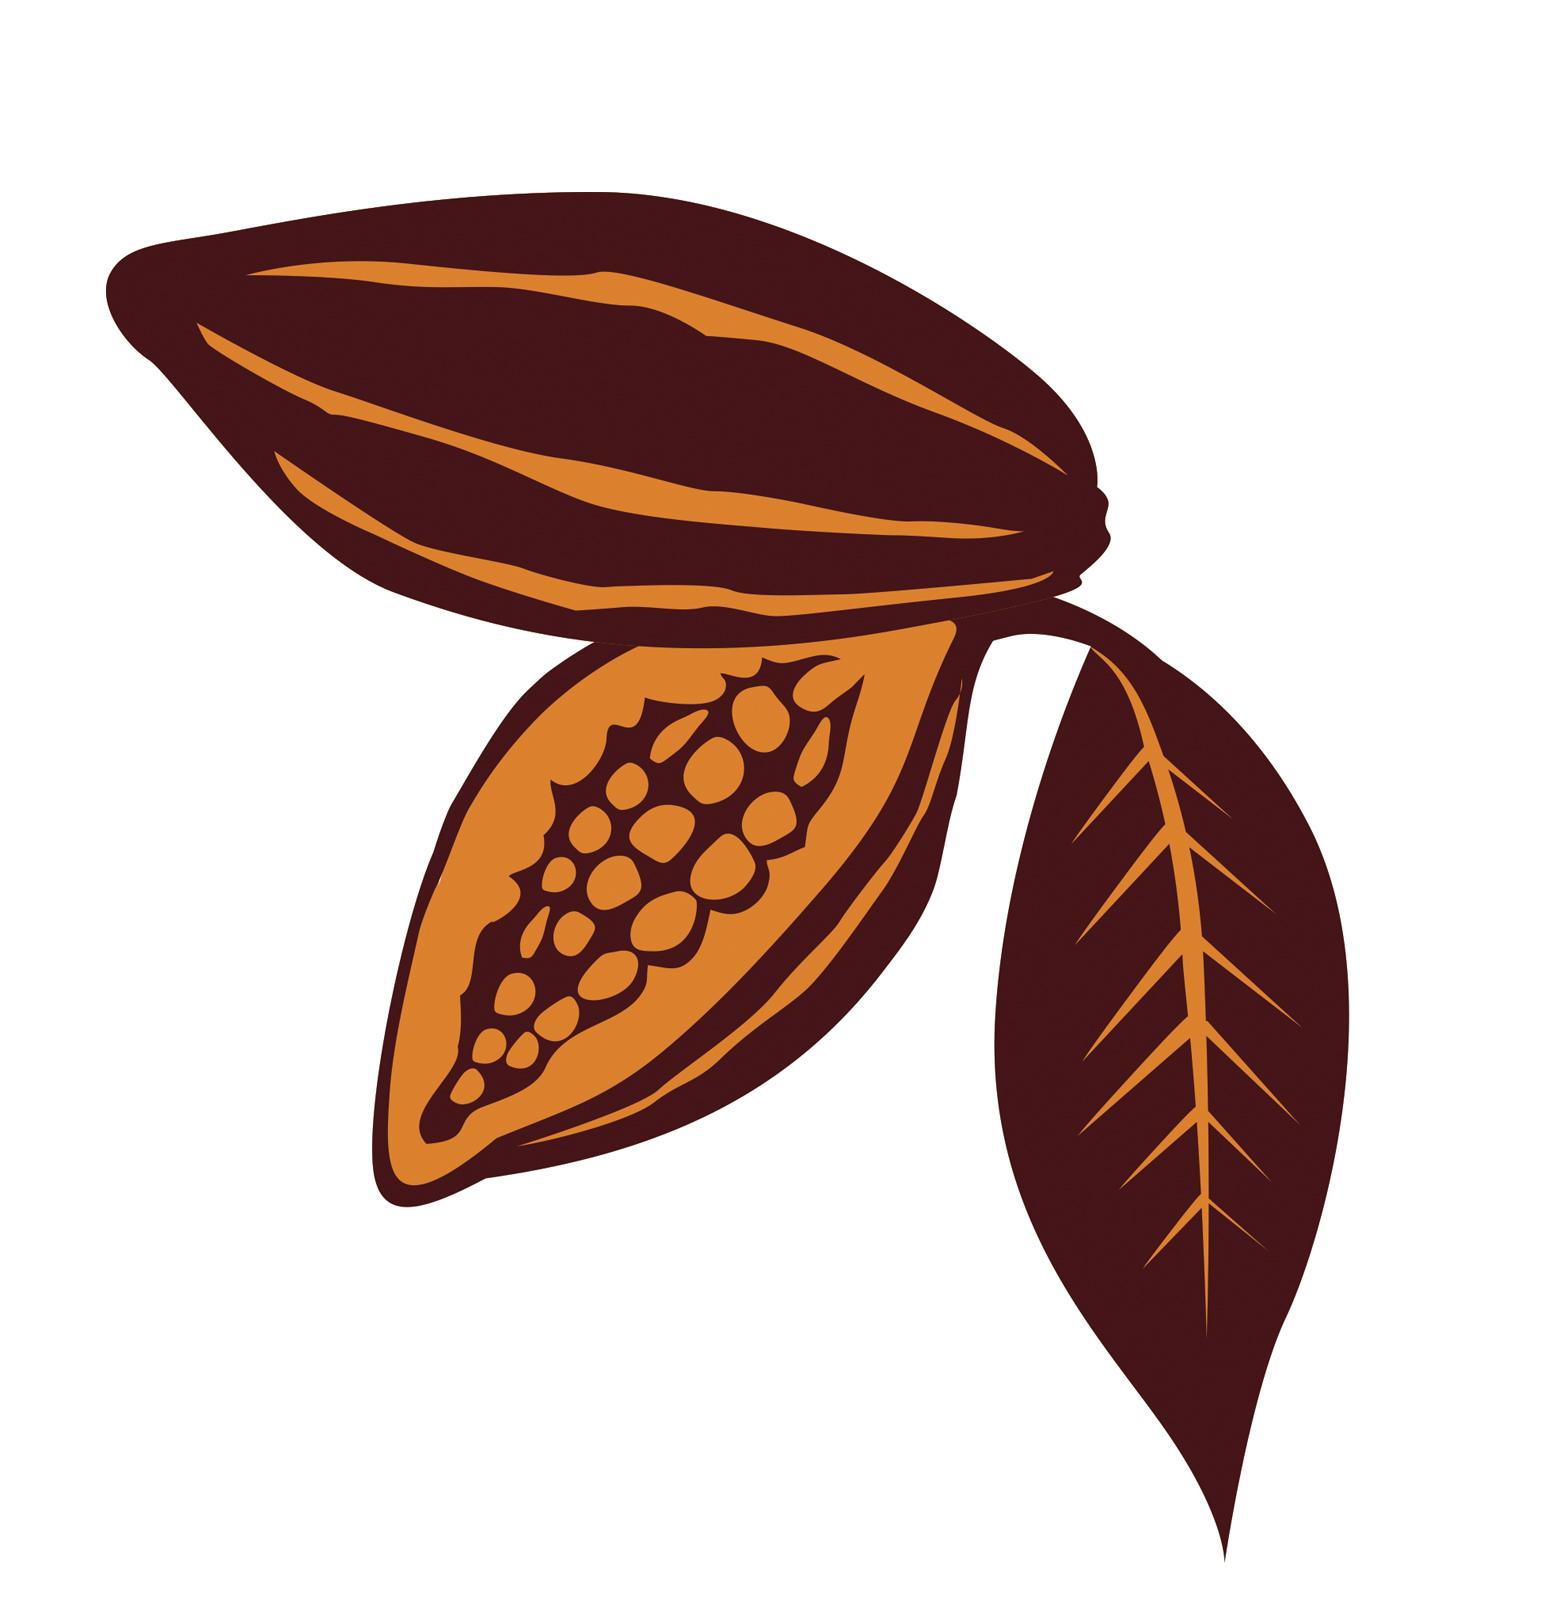 Cacao clipart dry bean LOGO Explore CON (grano IDENTIFICARA